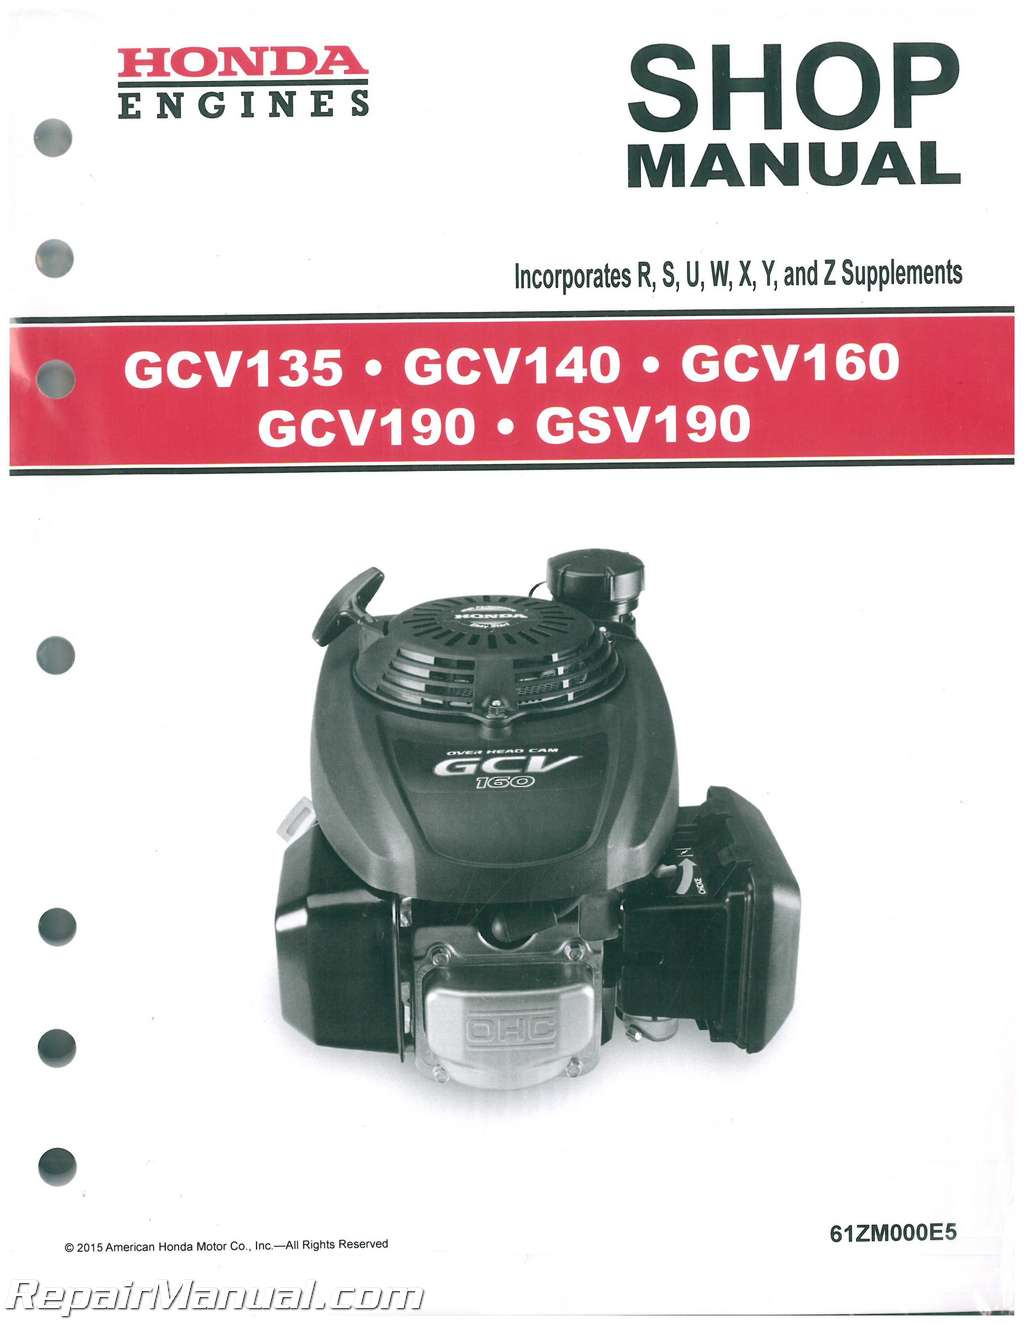 honda gcv135 gcv160 gcv190 and gsv190 engine shop manual rh repairmanual com Online Honda Repair Manual Honda Rebel Owner's Manual